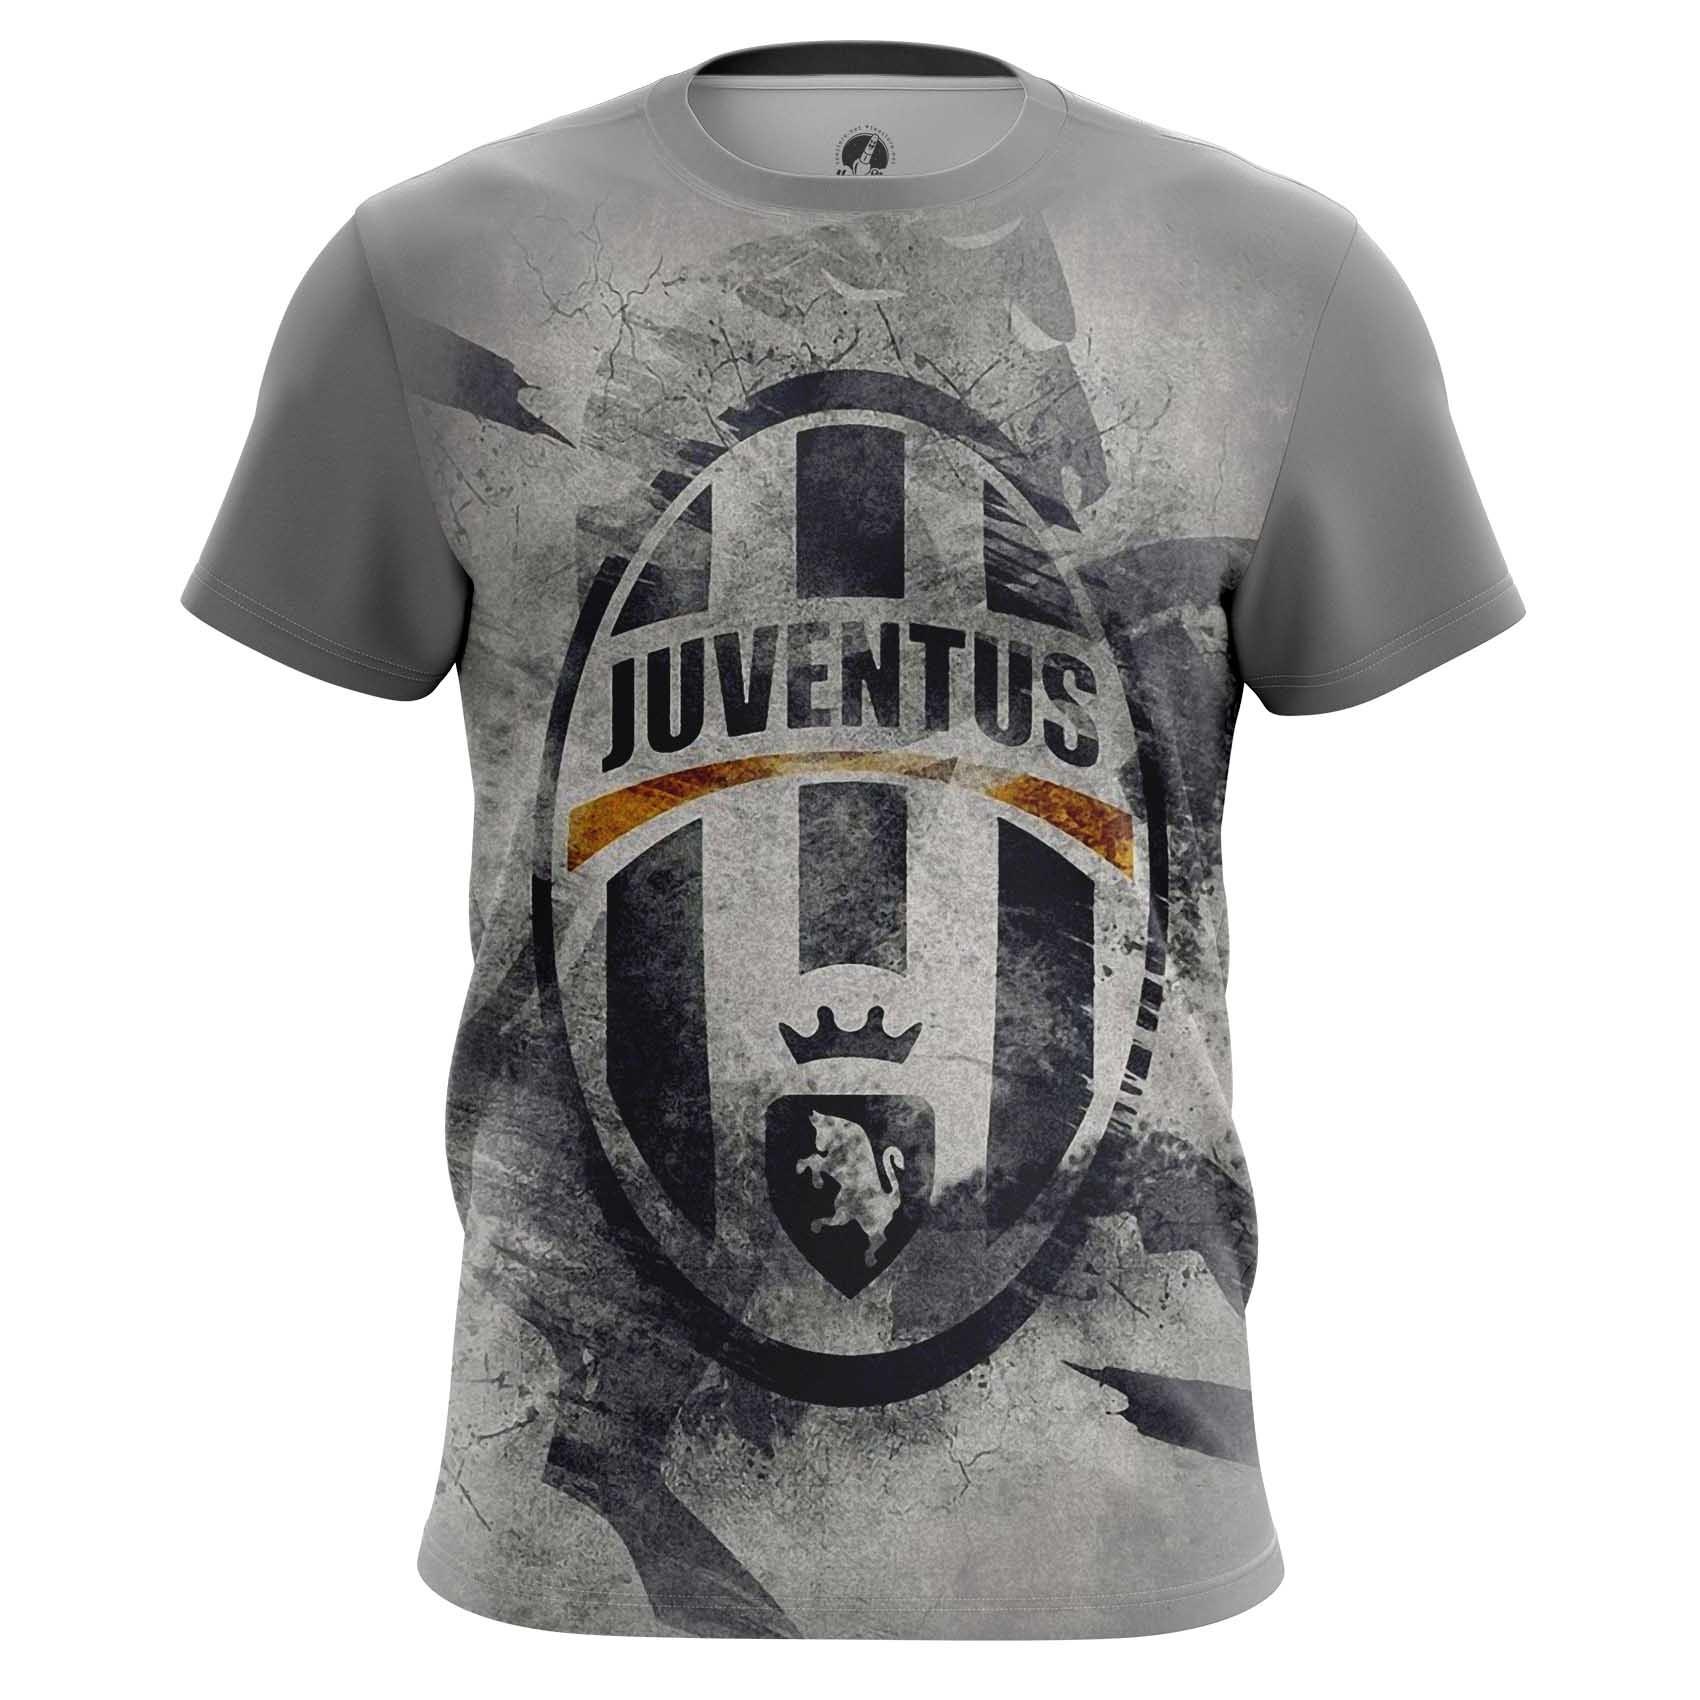 Collectibles Men'S T-Shirt Juventus Juv Fan Football